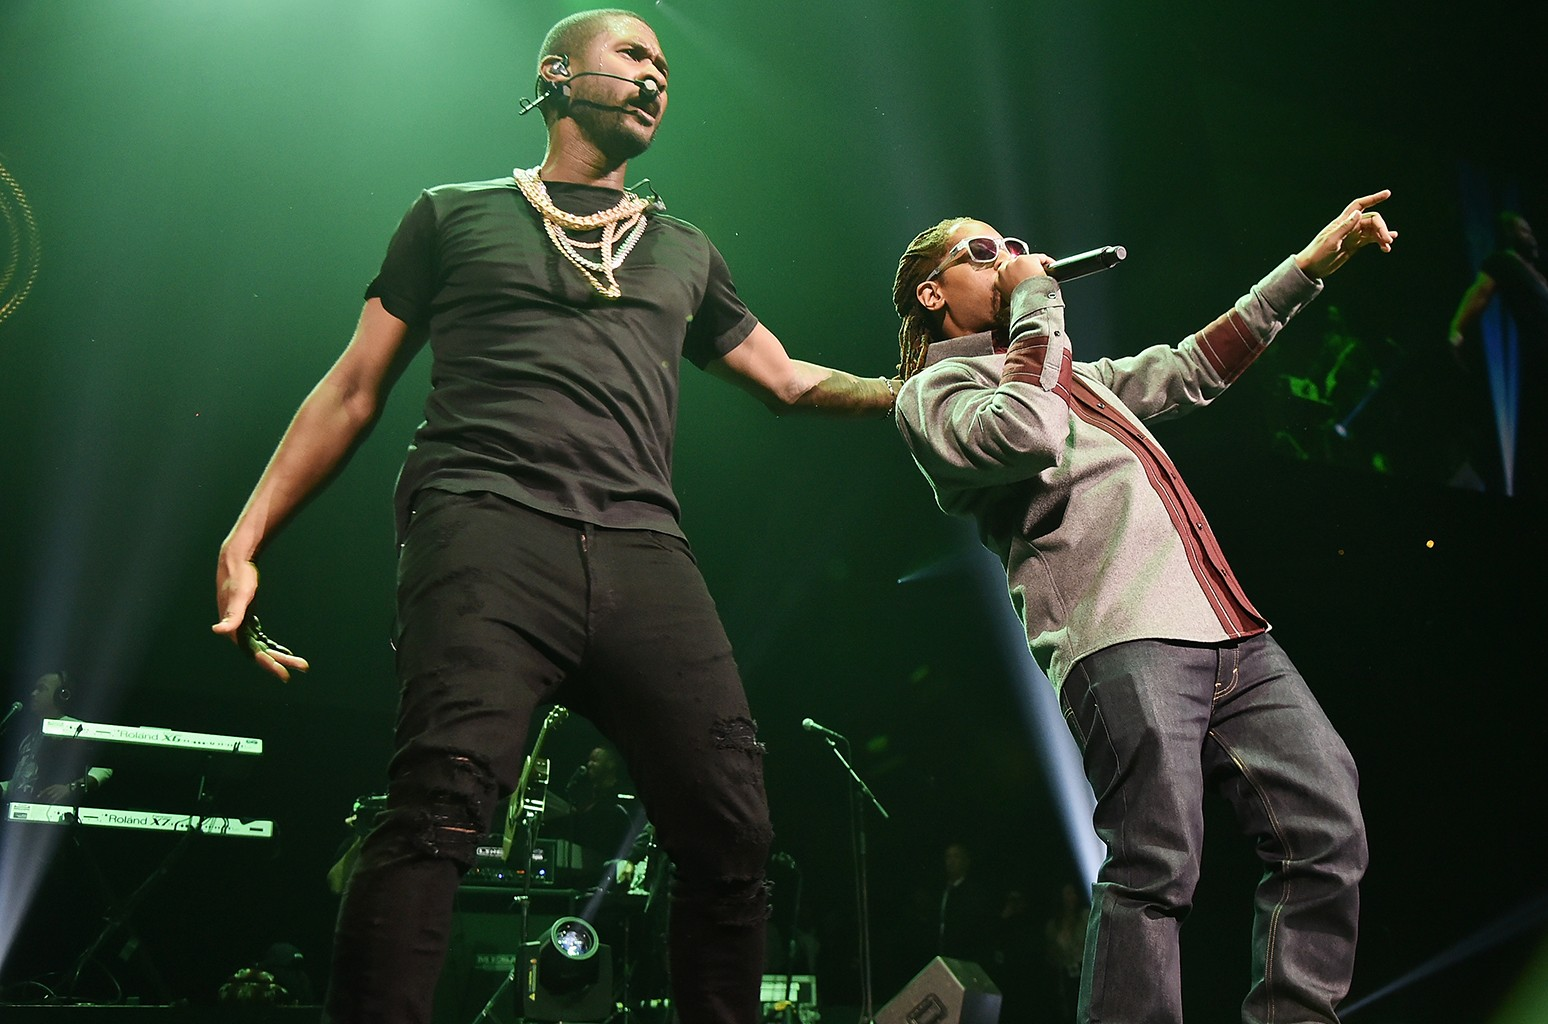 Usher and Lil Jon